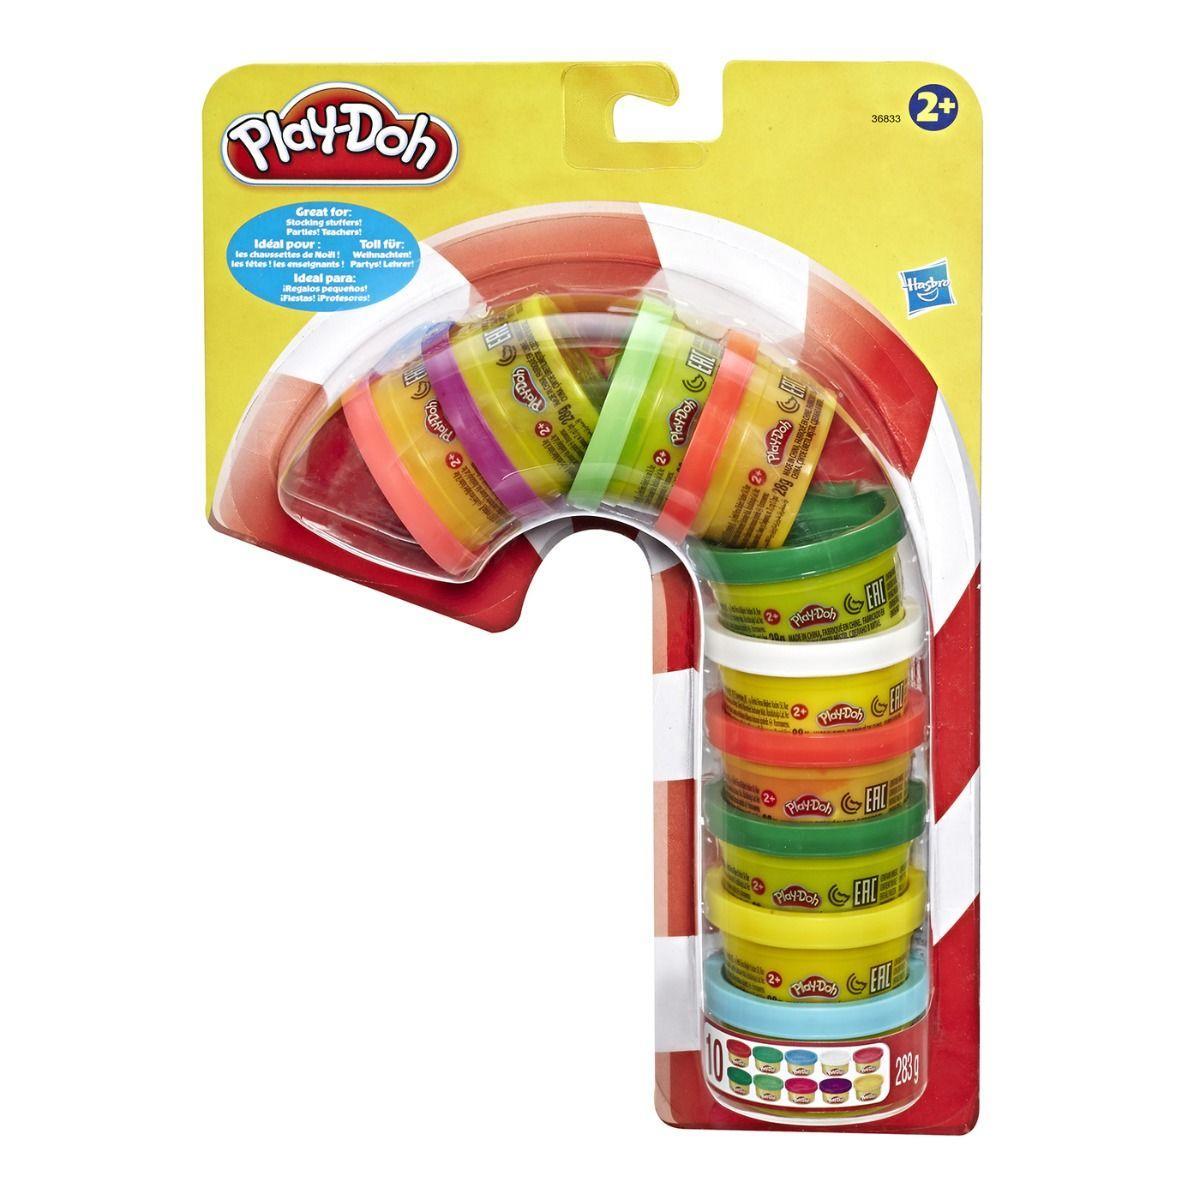 Пластилин Play-Doh. Пластилин. Набор для праздника